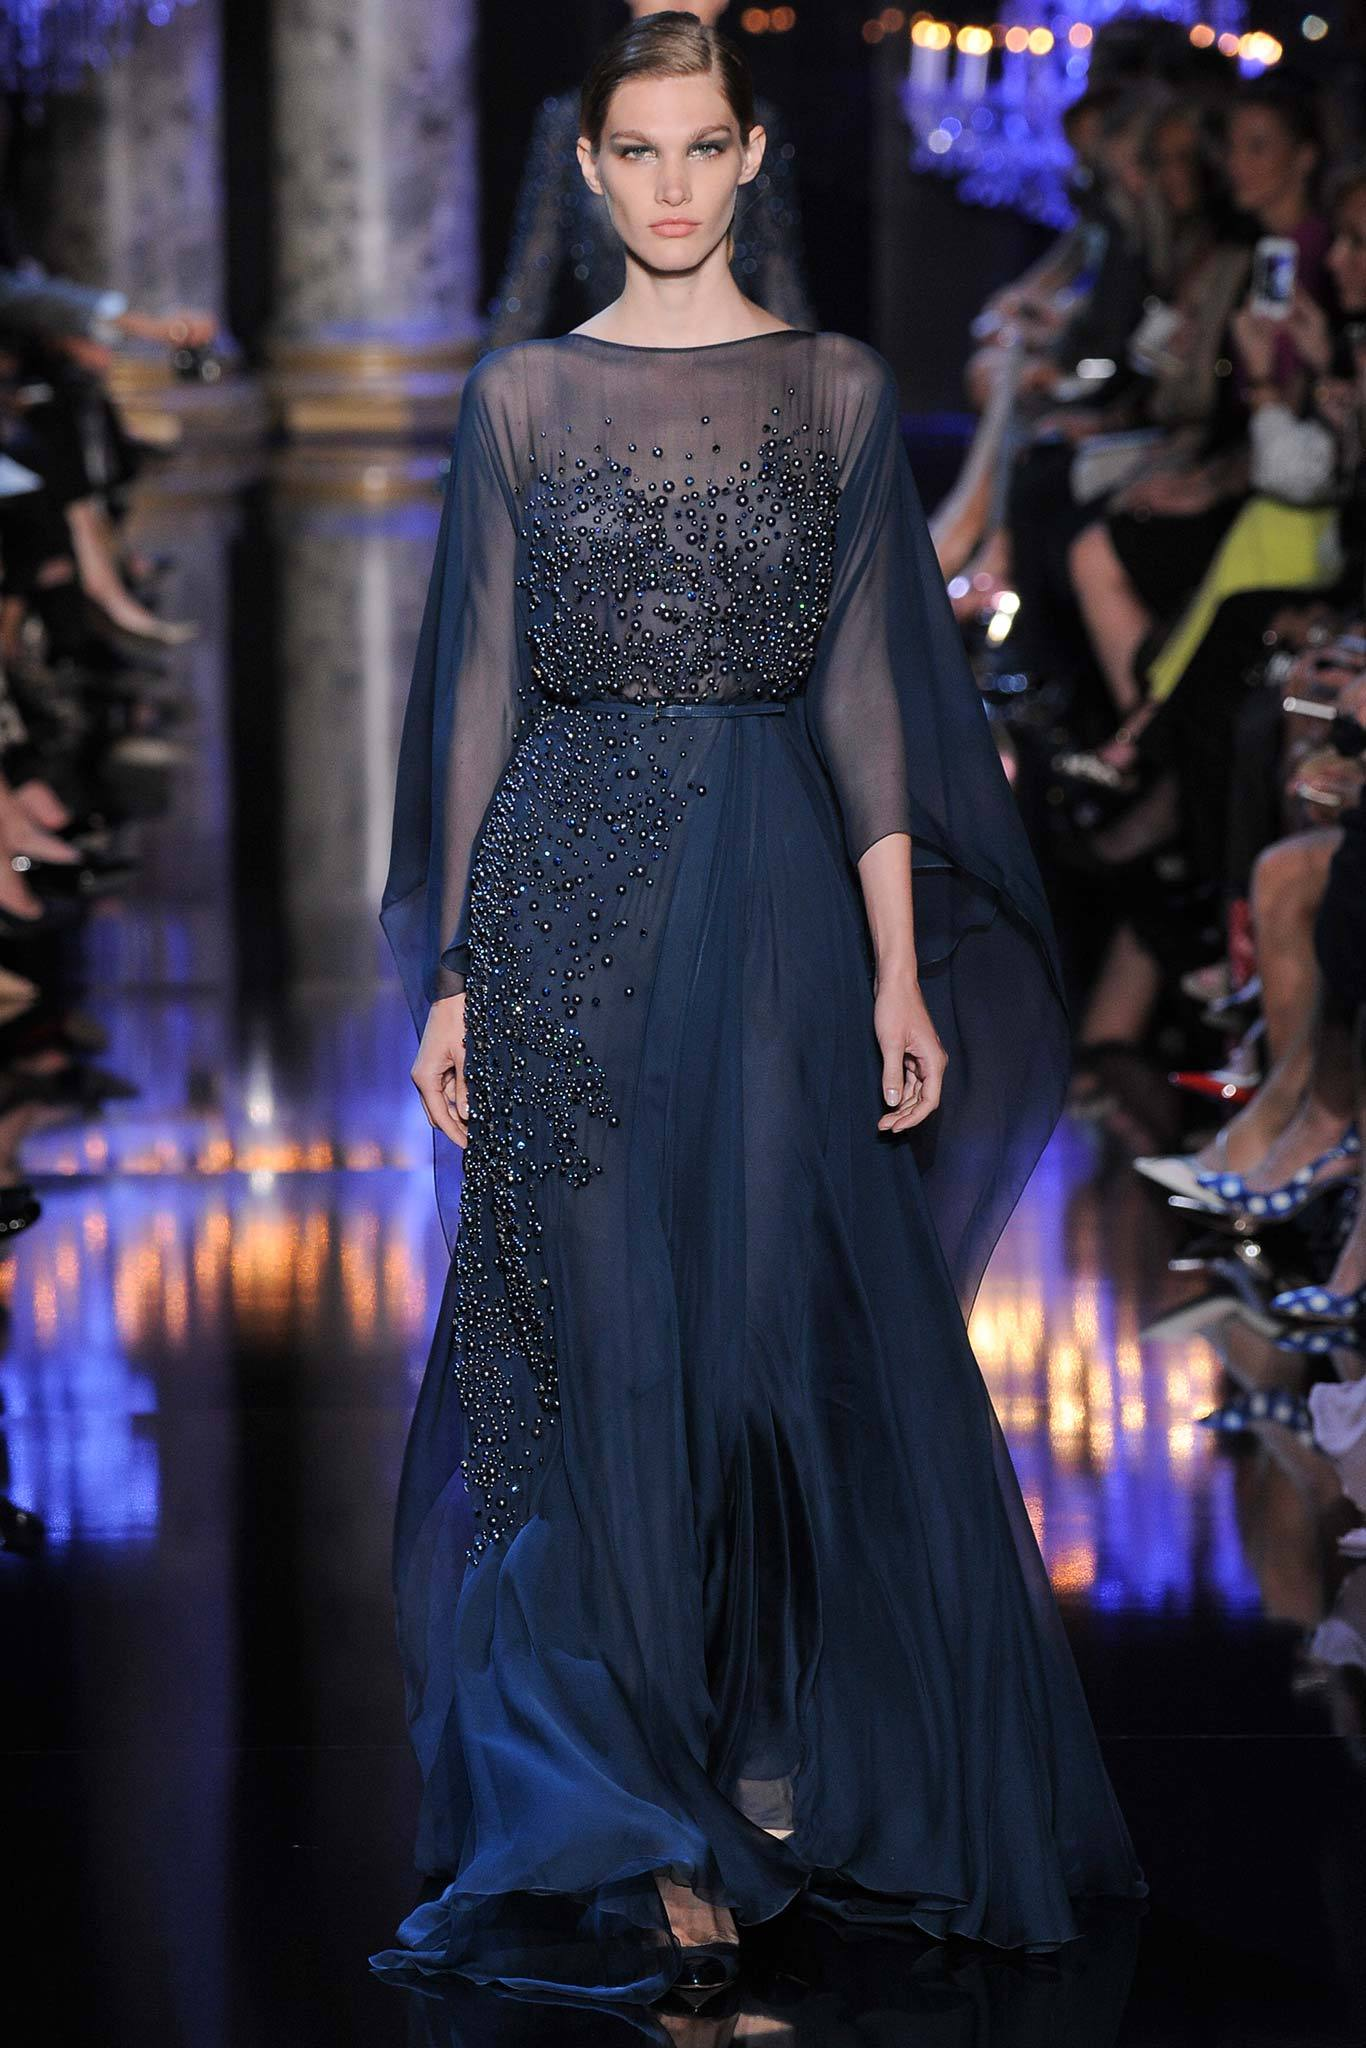 Elie-Saab-Couture-Fall2014-04.JPG